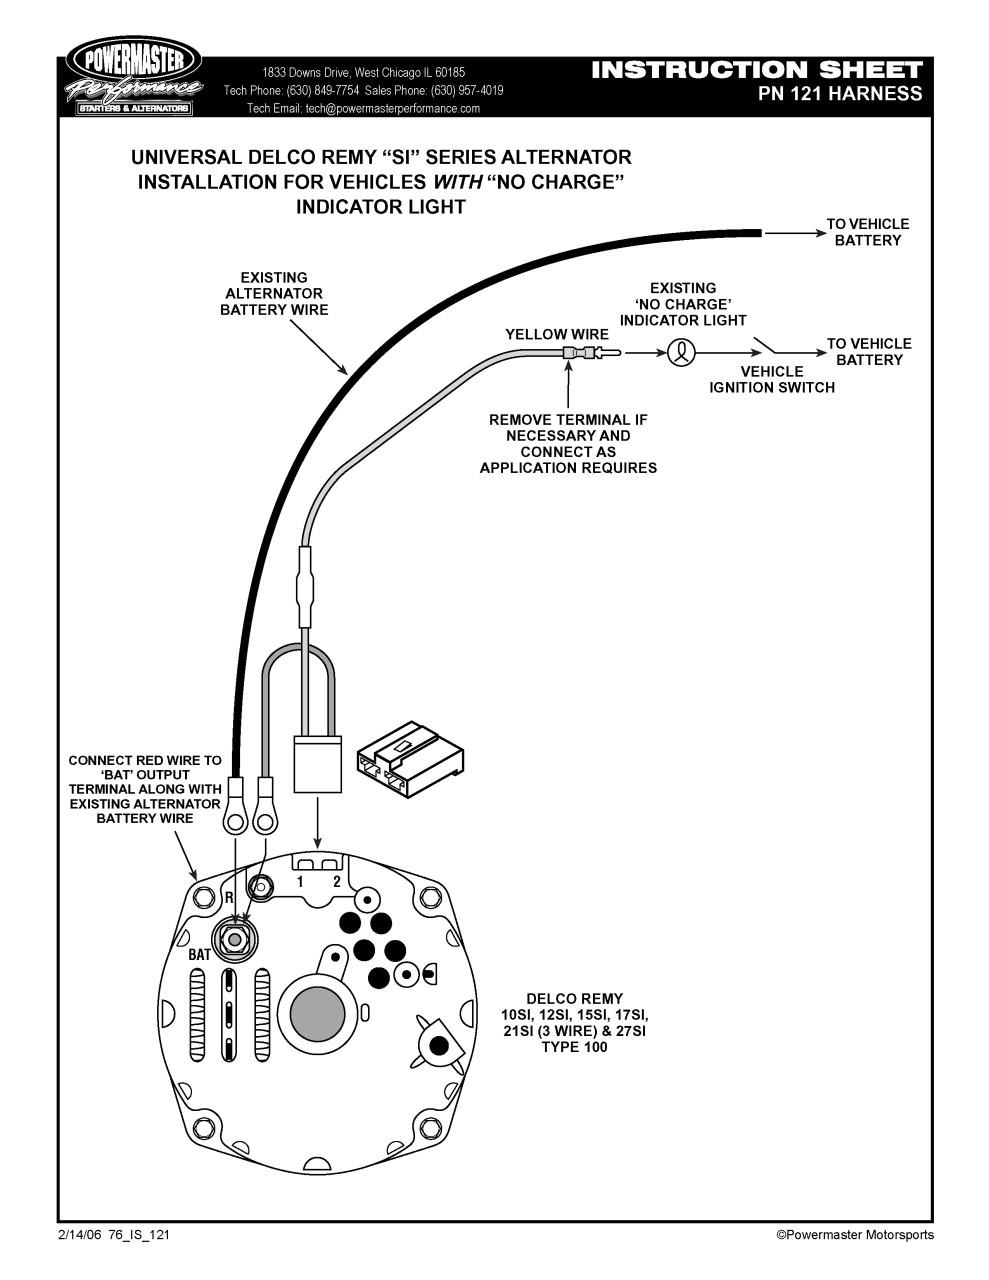 Denso 3 Wire Alternator Diagram - Wiring DiagramWiring Diagram